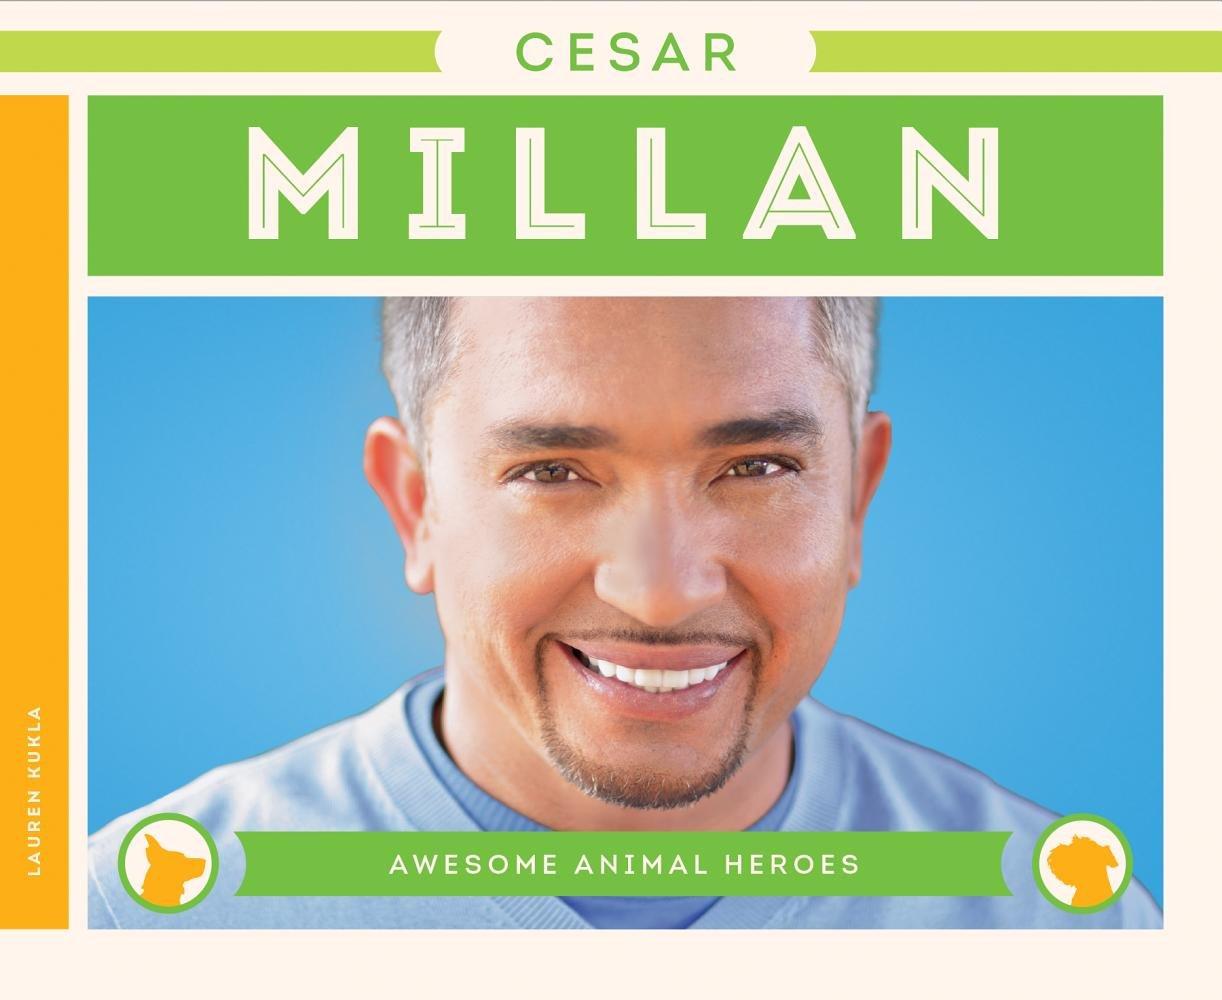 Cesar Millan (Awesome Animal Heroes)